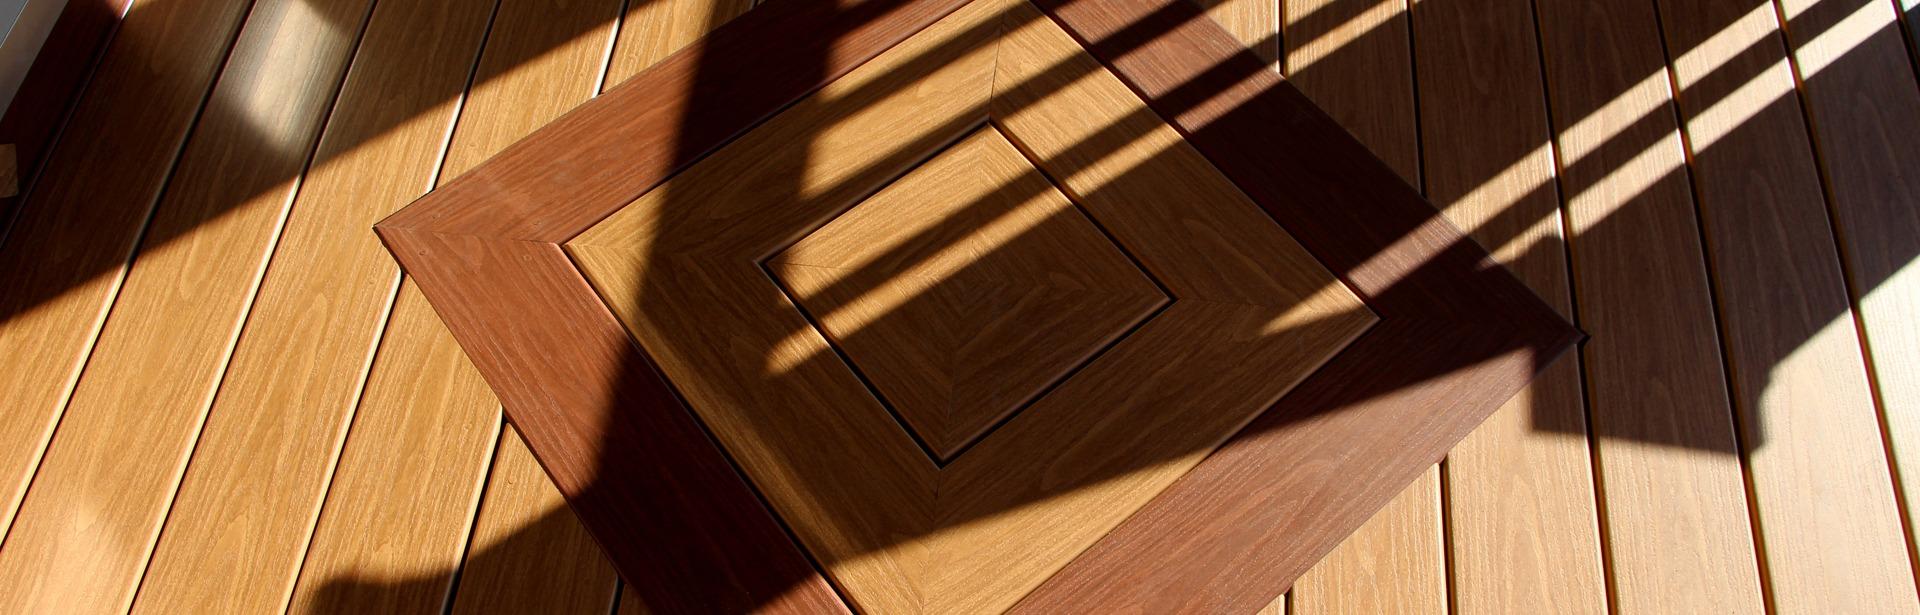 decks and porches